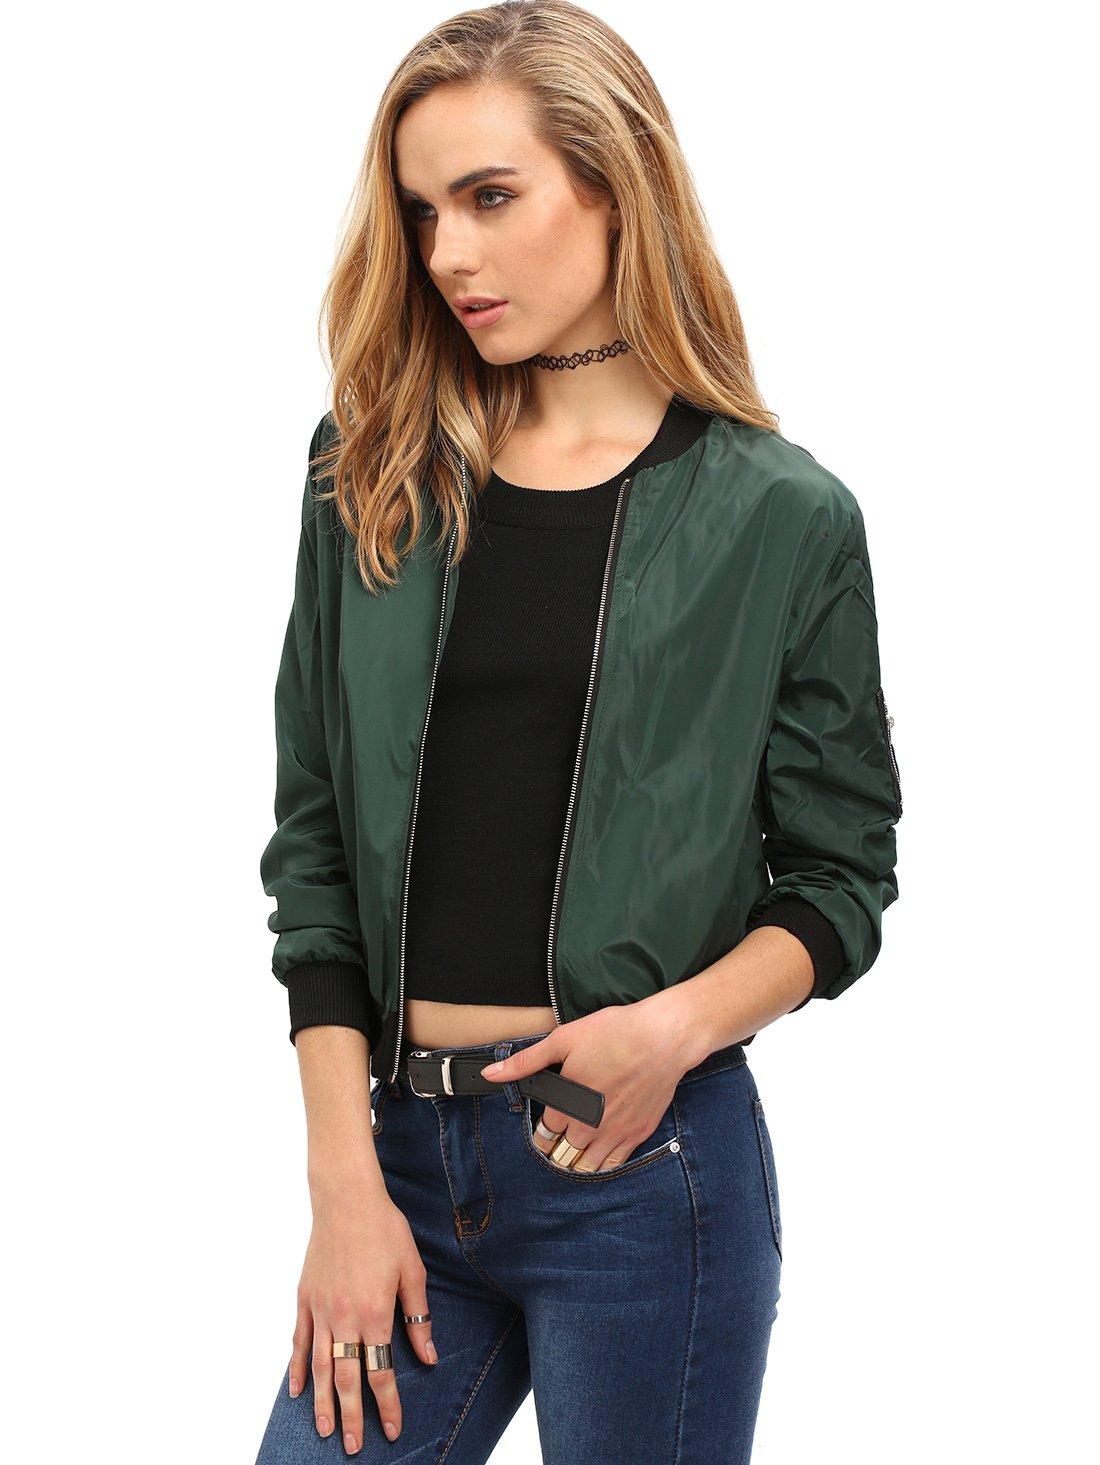 Romwe Women's Classic Zipper Short Bomber Jacket Coat Green L